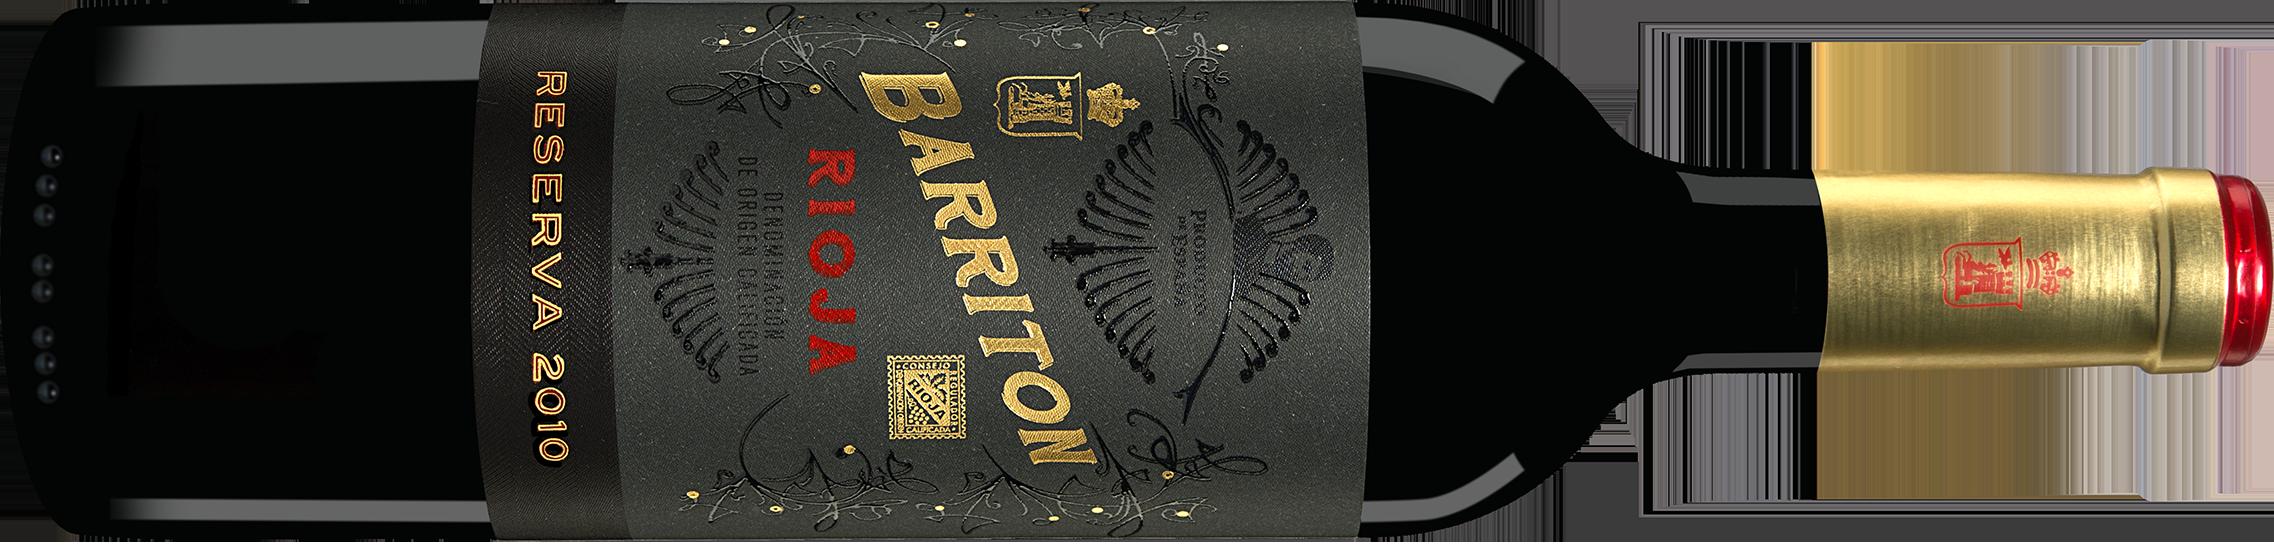 Barriton Gran Reserva 2008